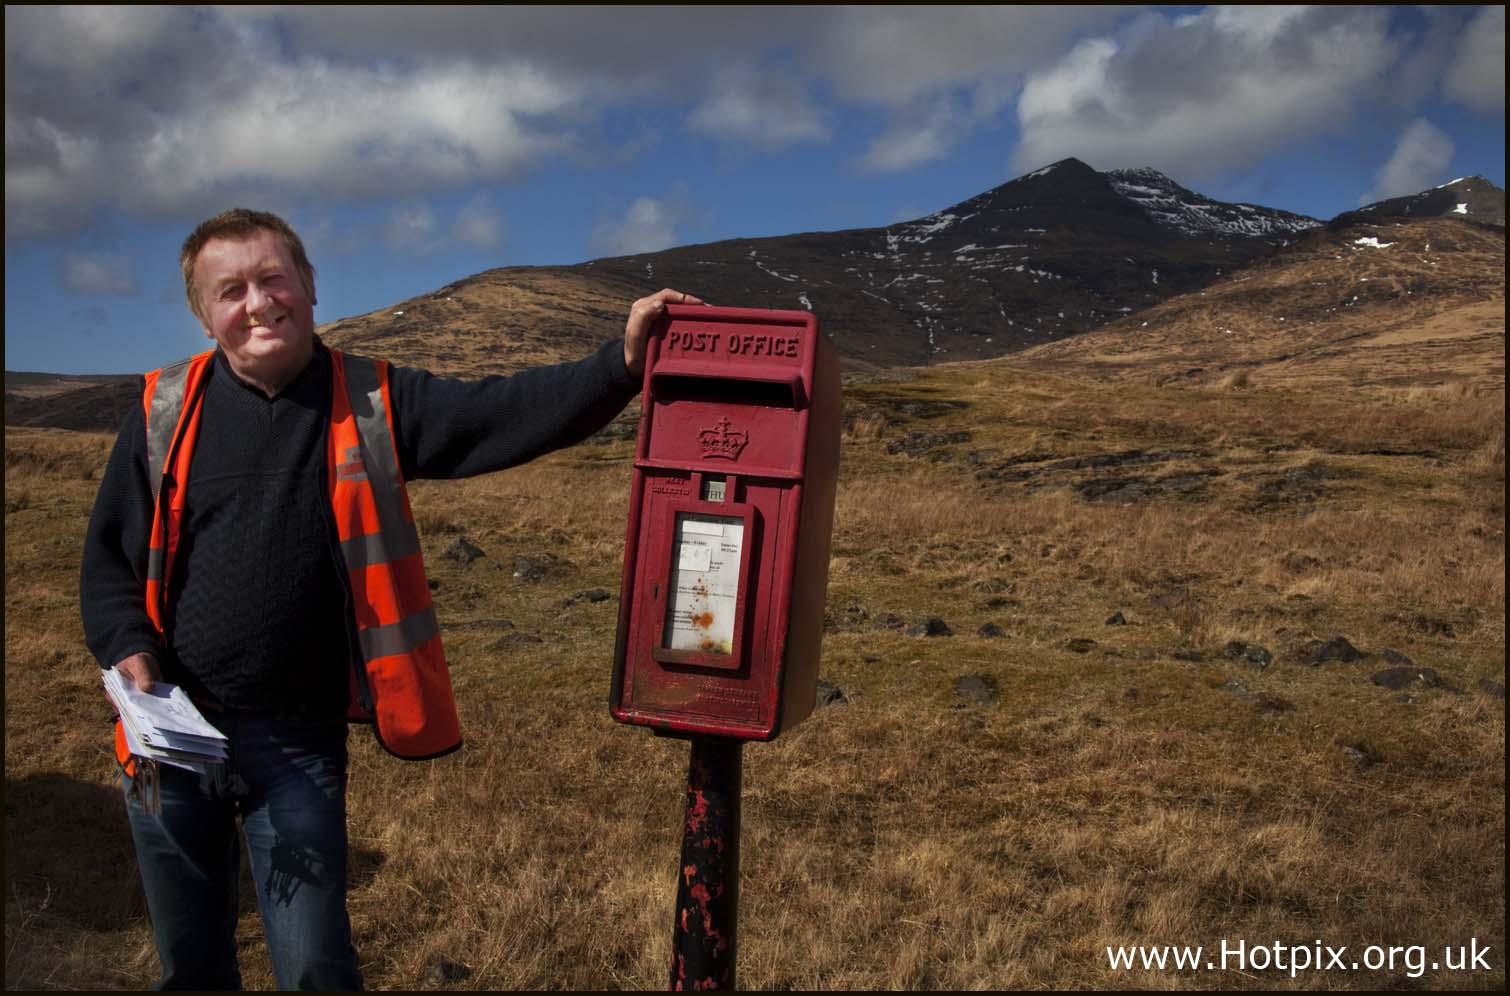 post,man,postman,isle,mull,scotland,west,islands,inner,hebrides,sea,letterbox,letter,box,red,mountains,UK,britain,royal,mail,postie,posty,bus,postbus,highway,road,interesting,people,person,persons,persona,interesante,edinbrugh,hotpix!